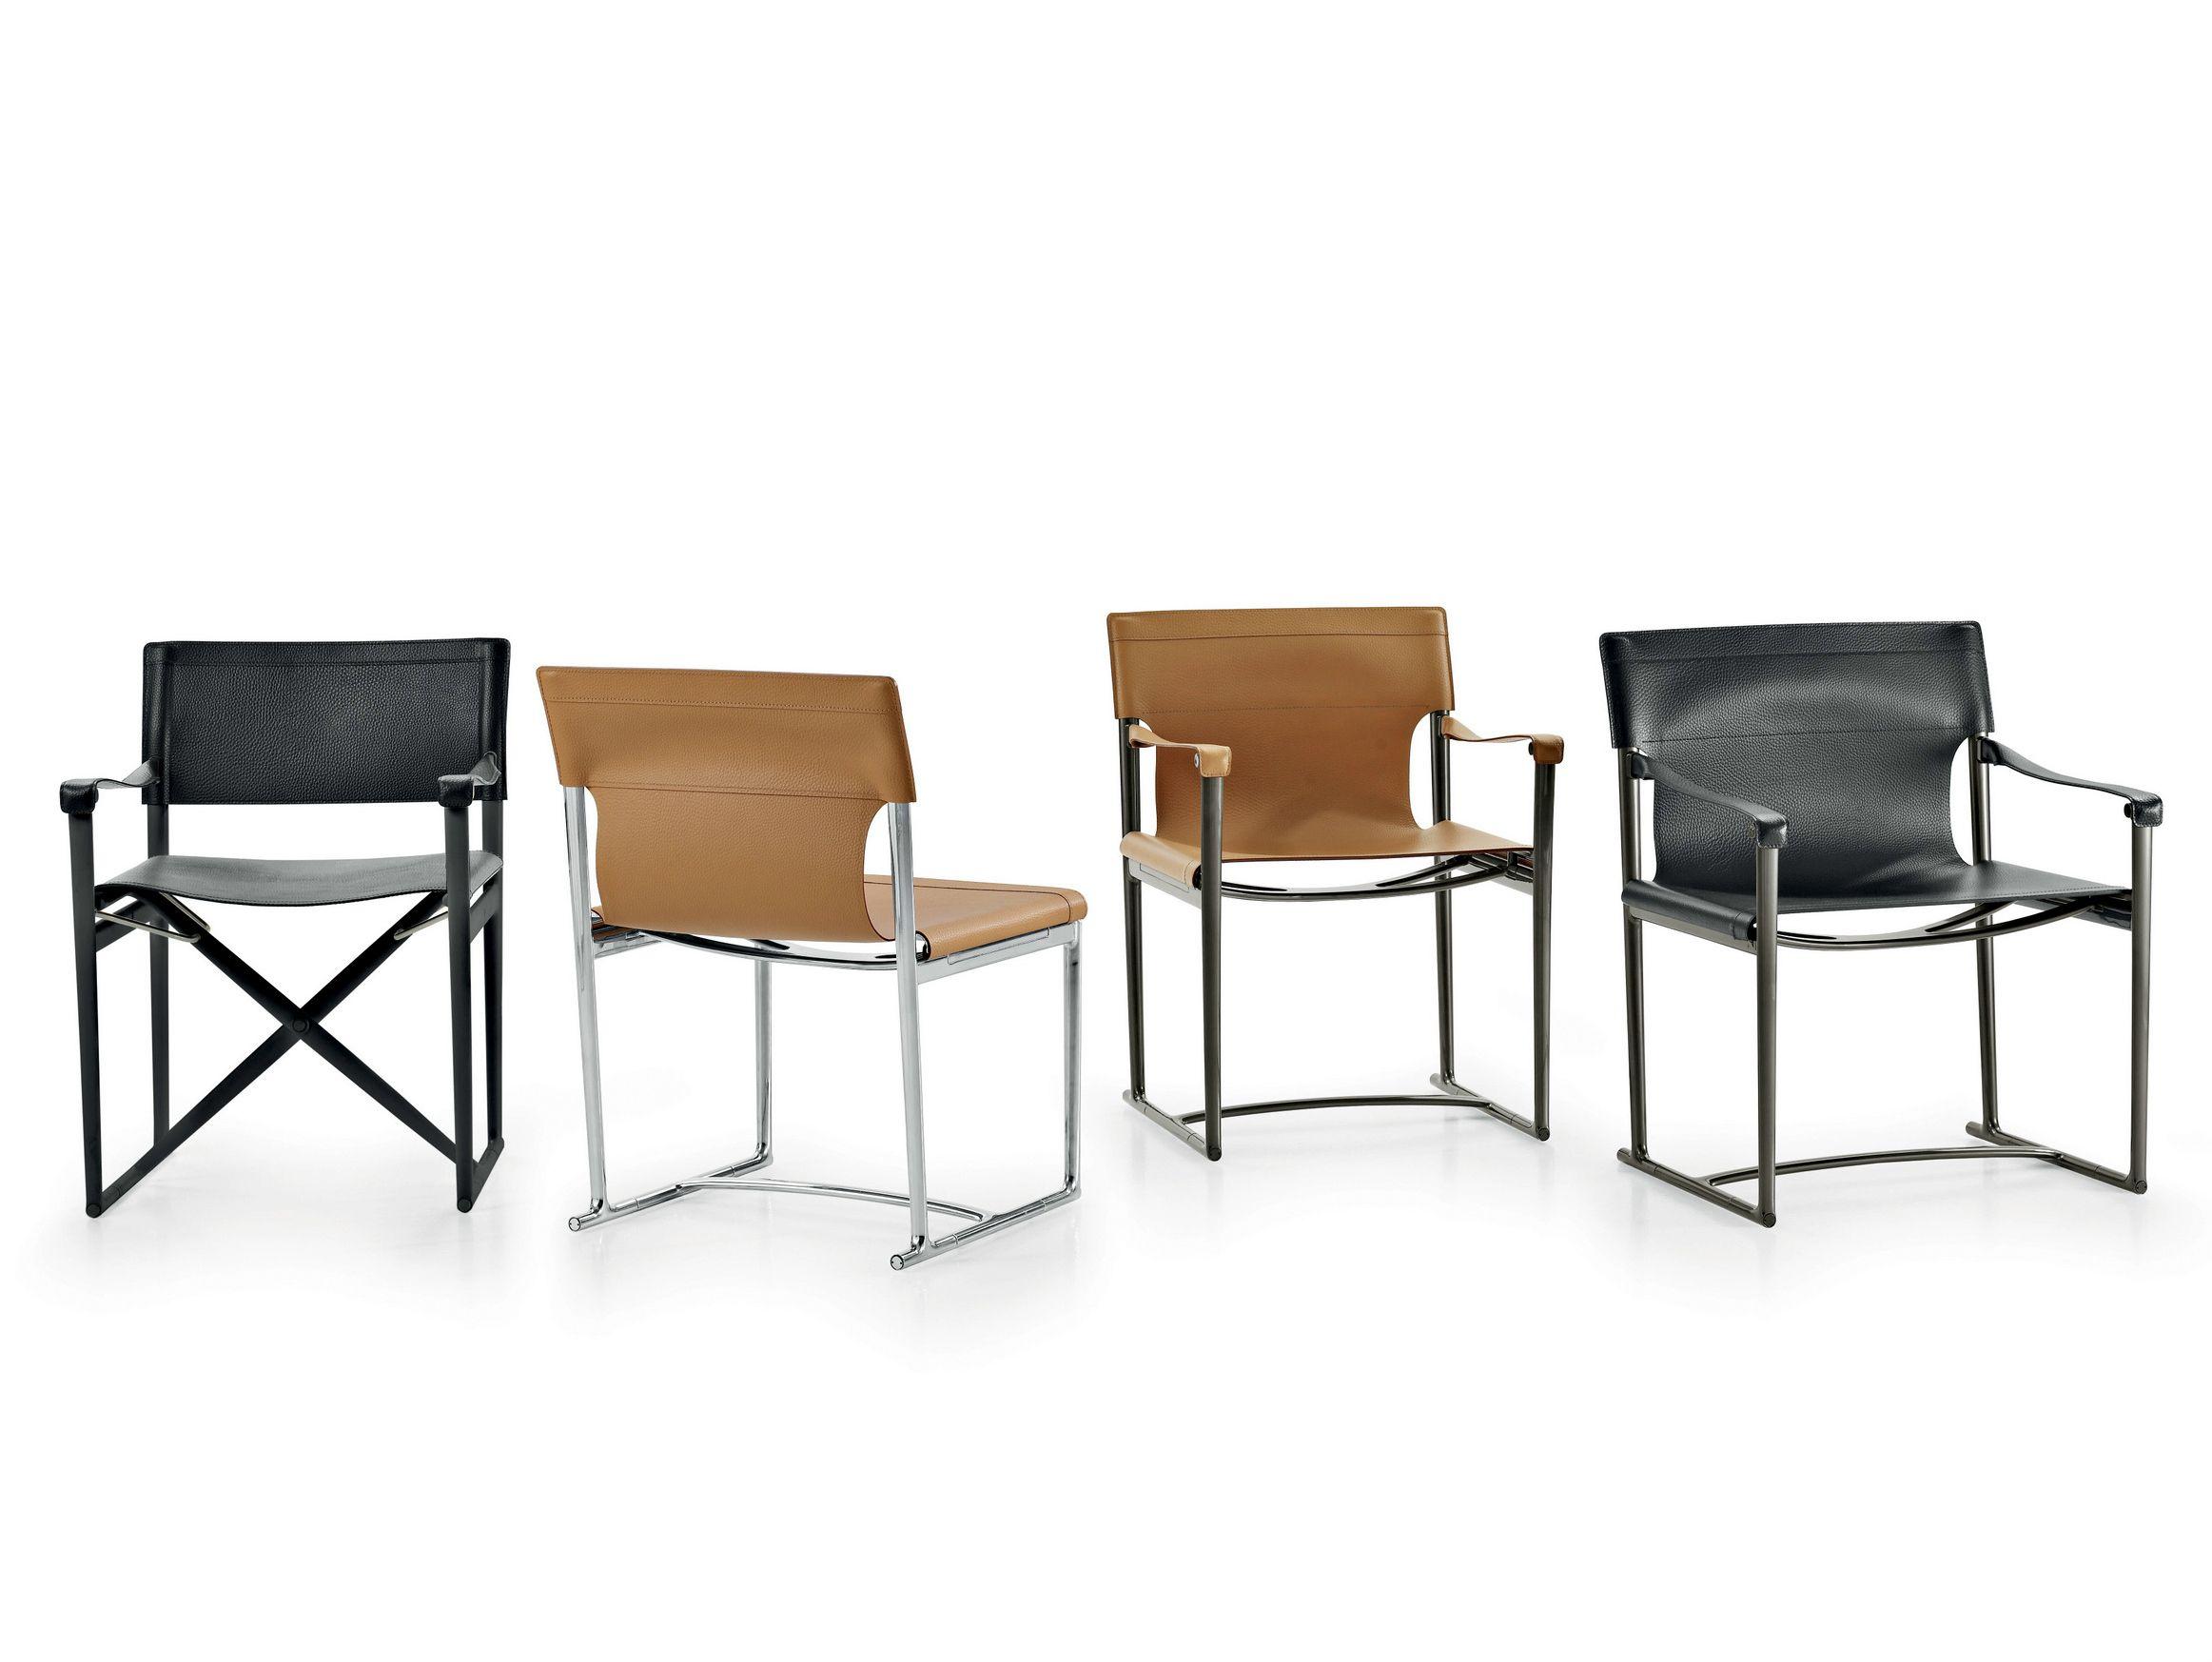 Mirto indoor sedia pieghevole by b b italia design antonio for Sedia design pieghevole